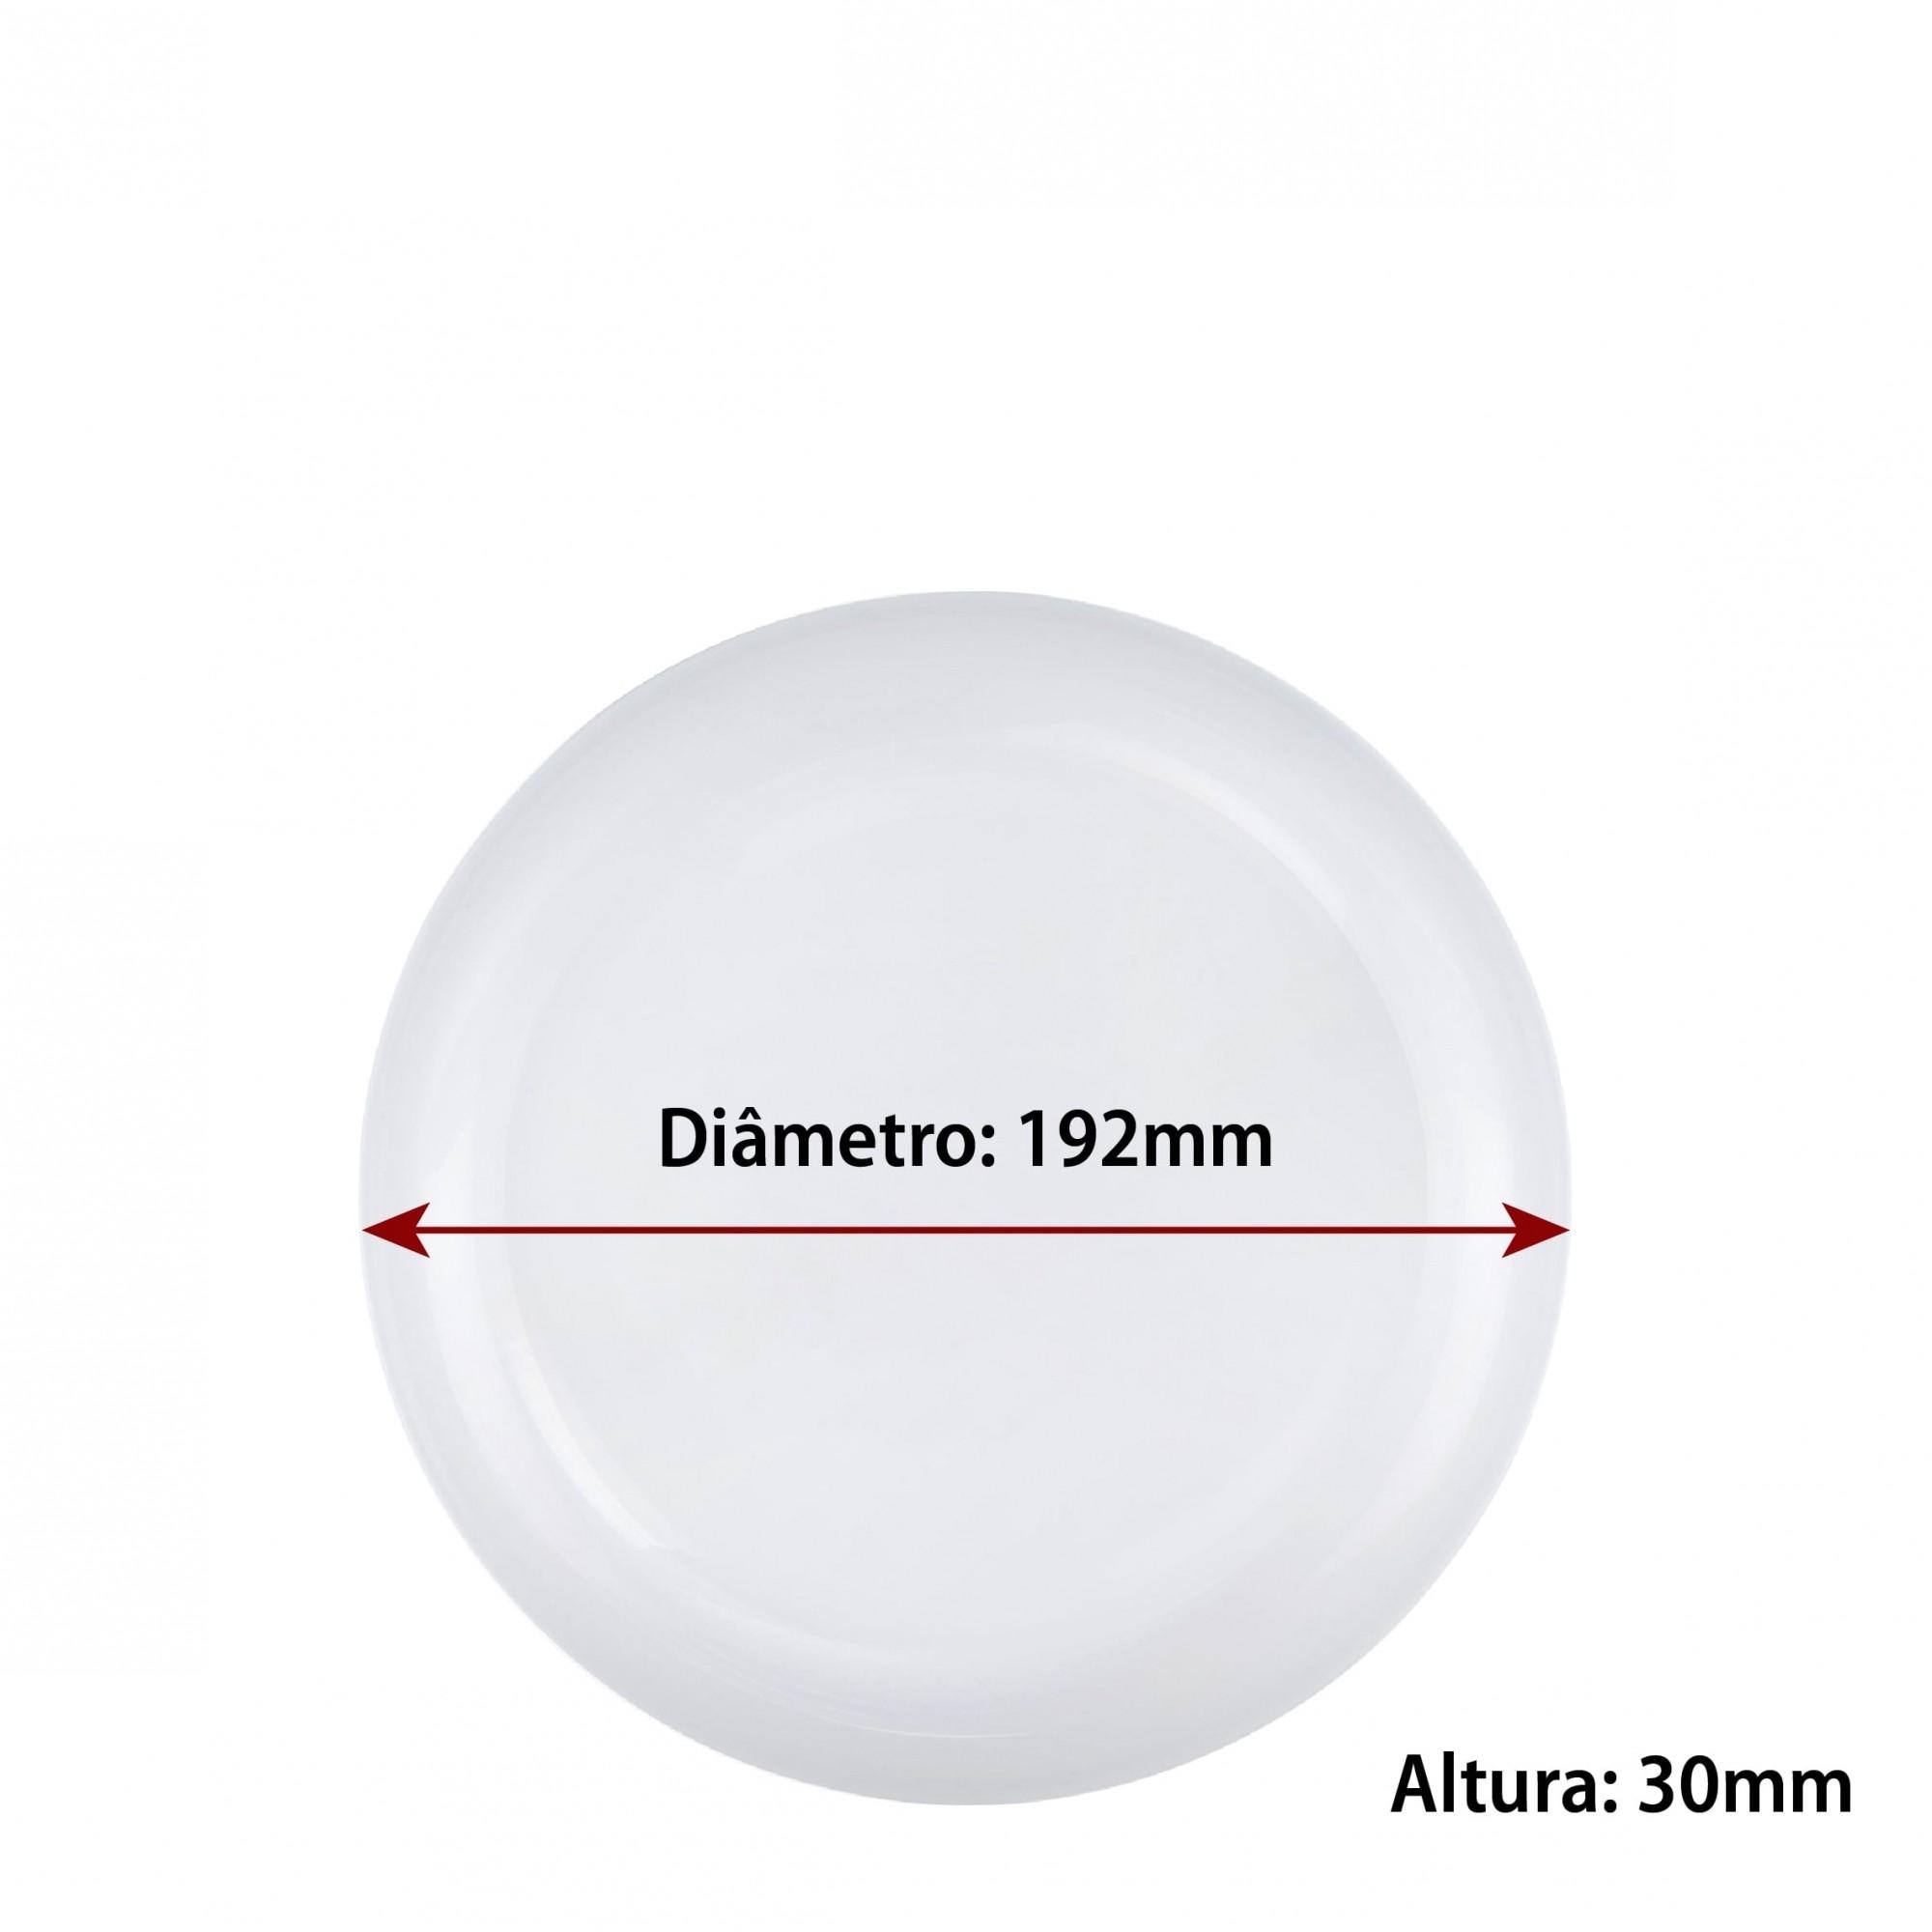 Jogo de Pratos de Vidro de Sobremesa Branco 19cm 6 Pcs